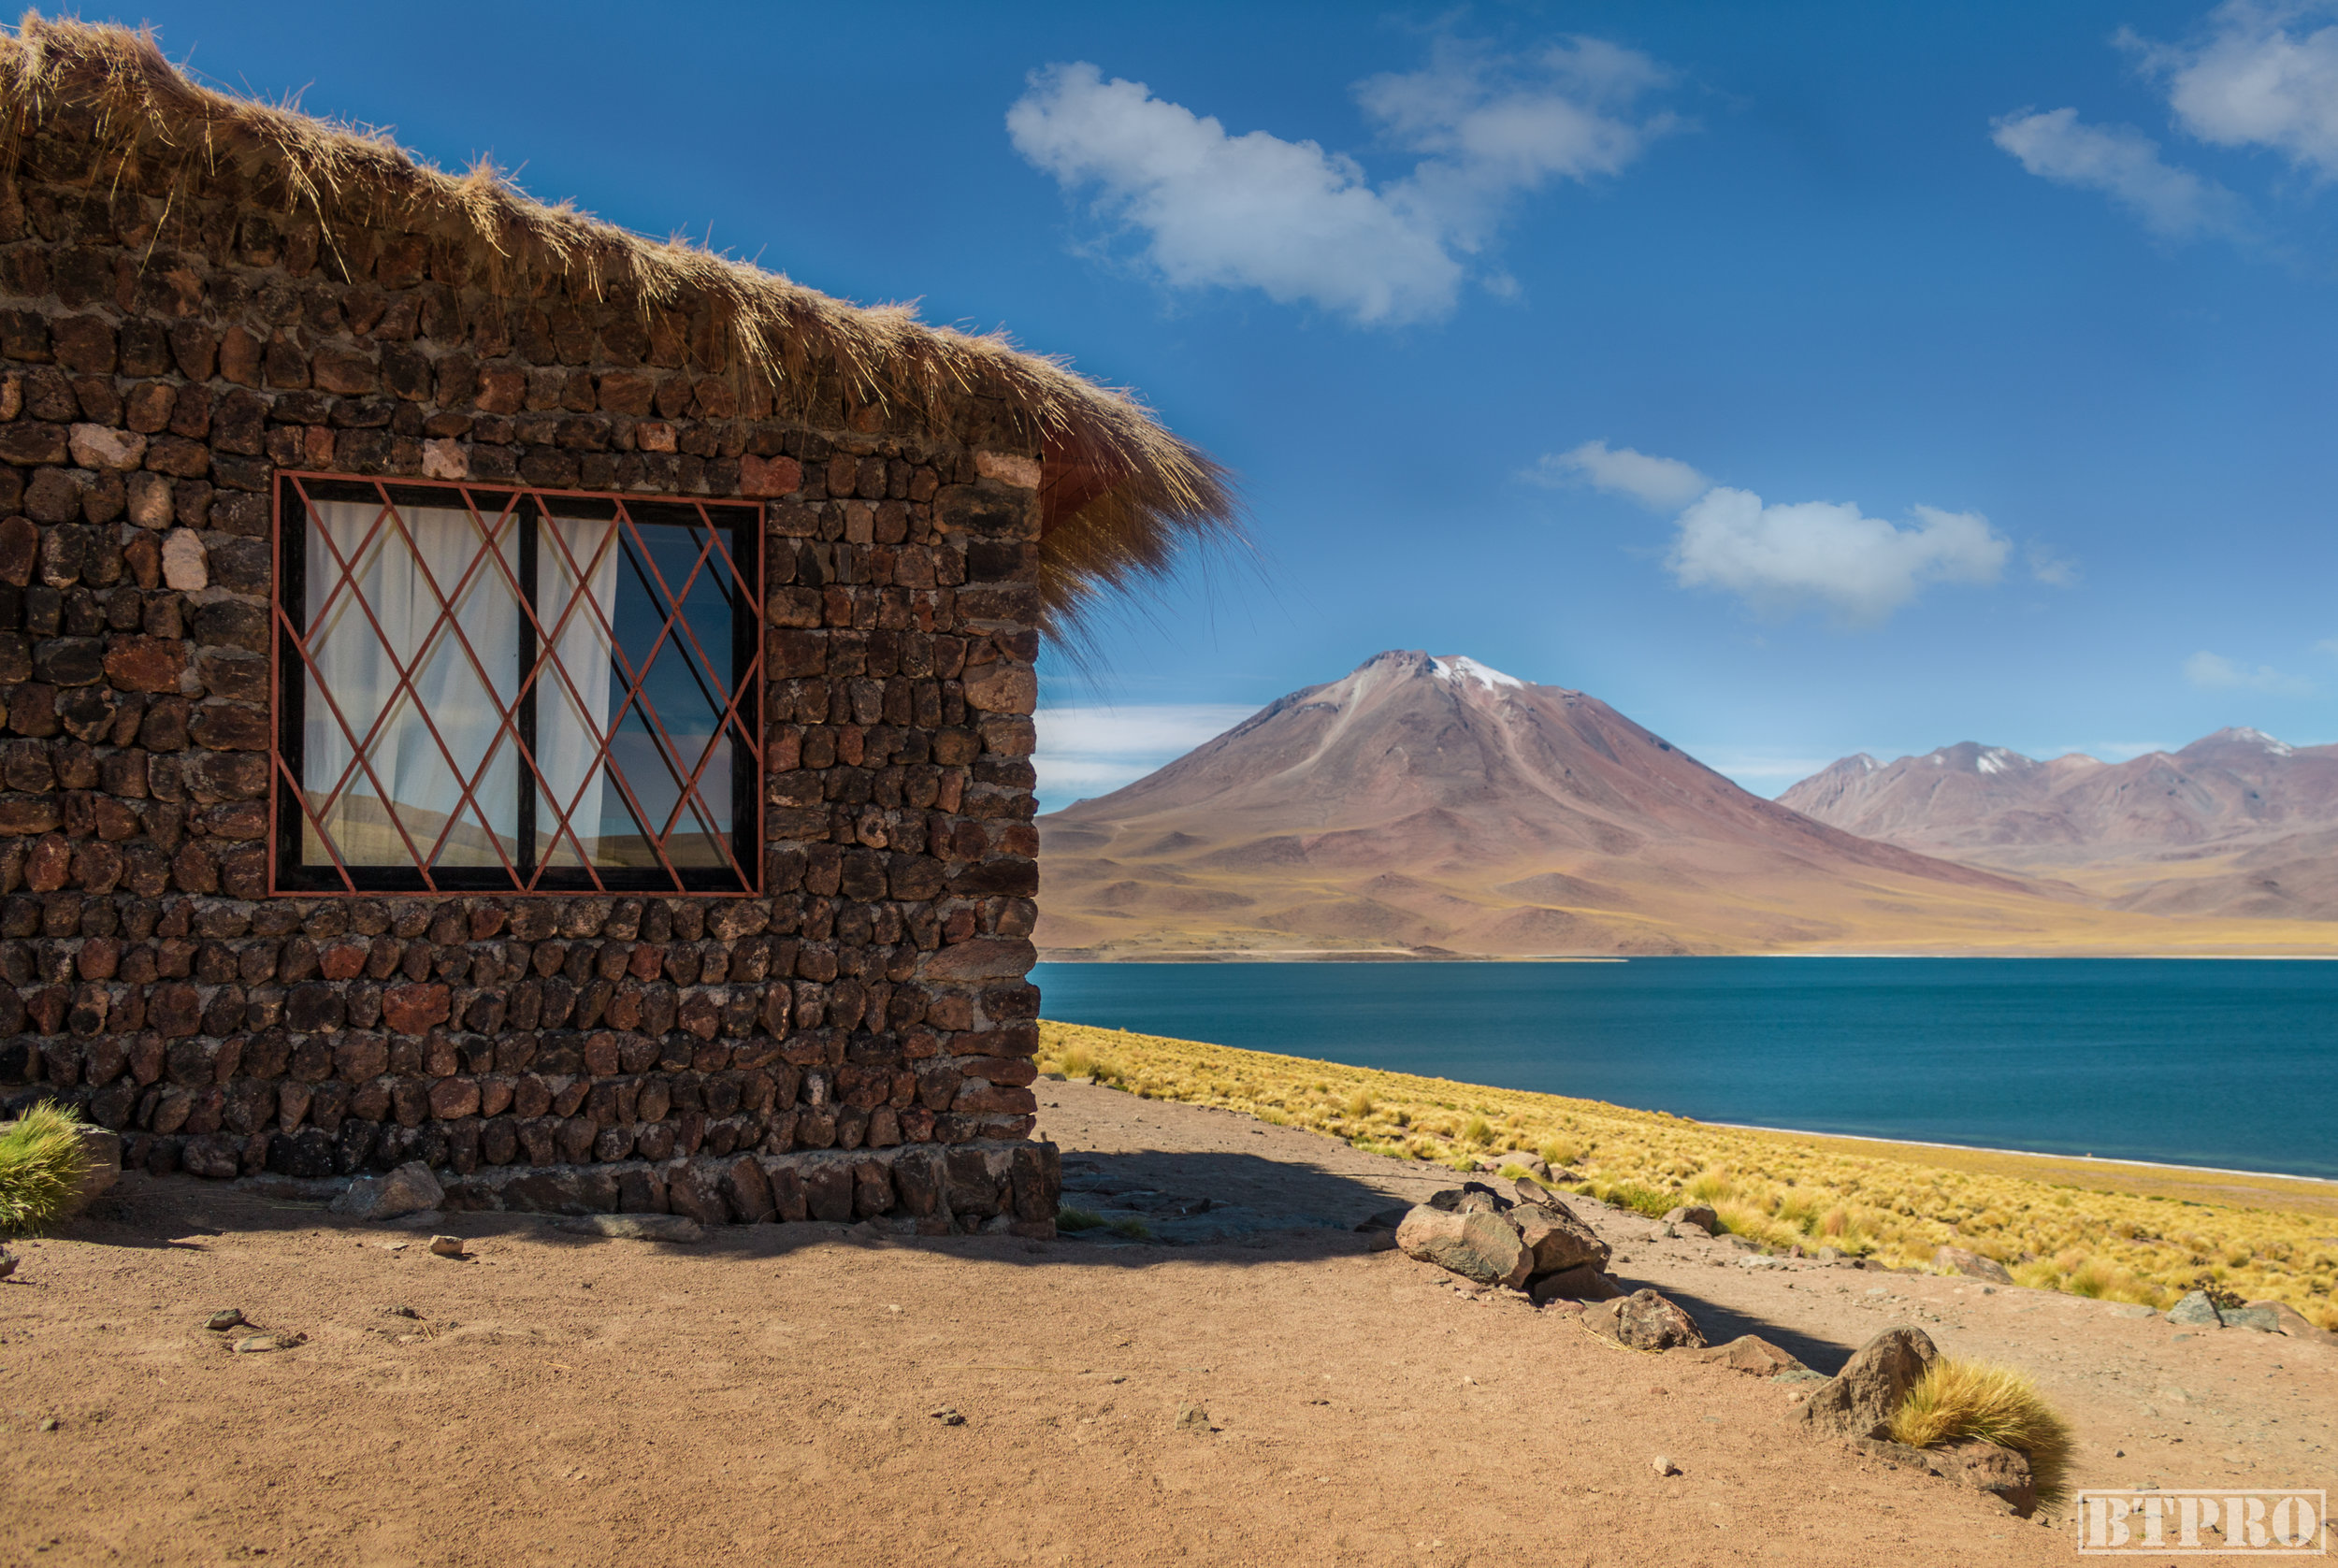 cabin, lagunas altiplanicas, chile, nature, wildife, nature photography